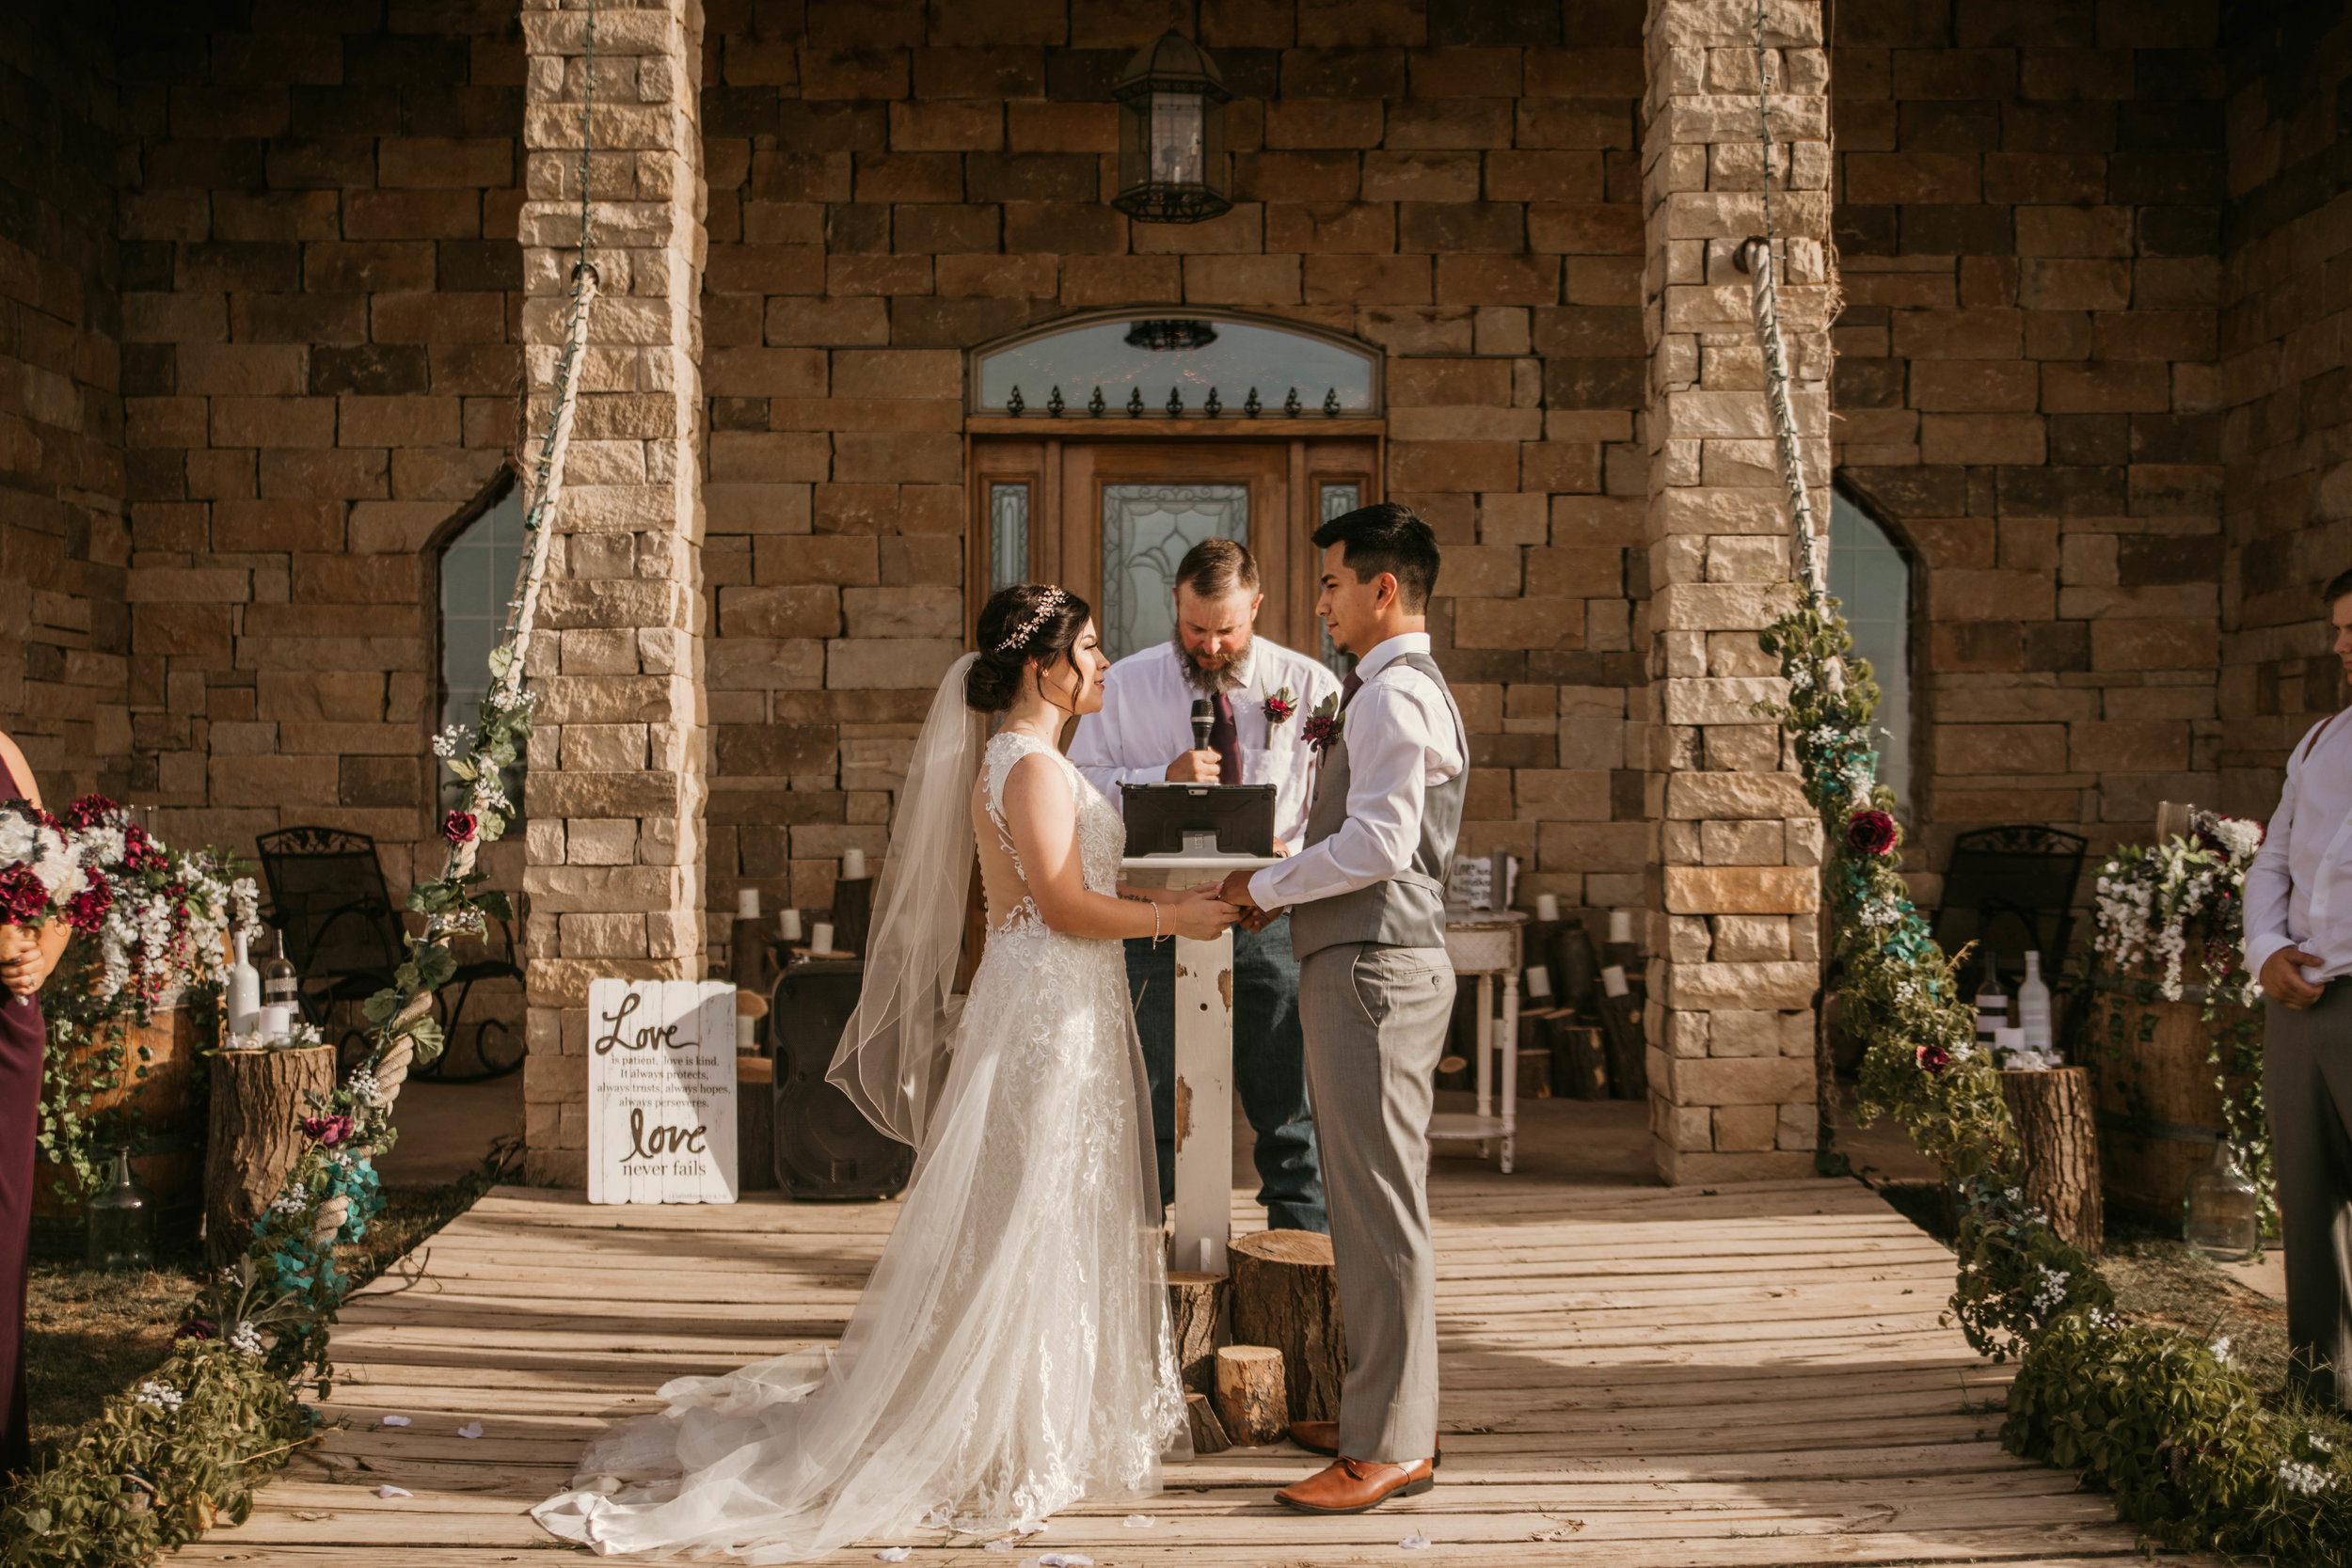 Lubbock,Texas WeddingDM7A1114.jpg